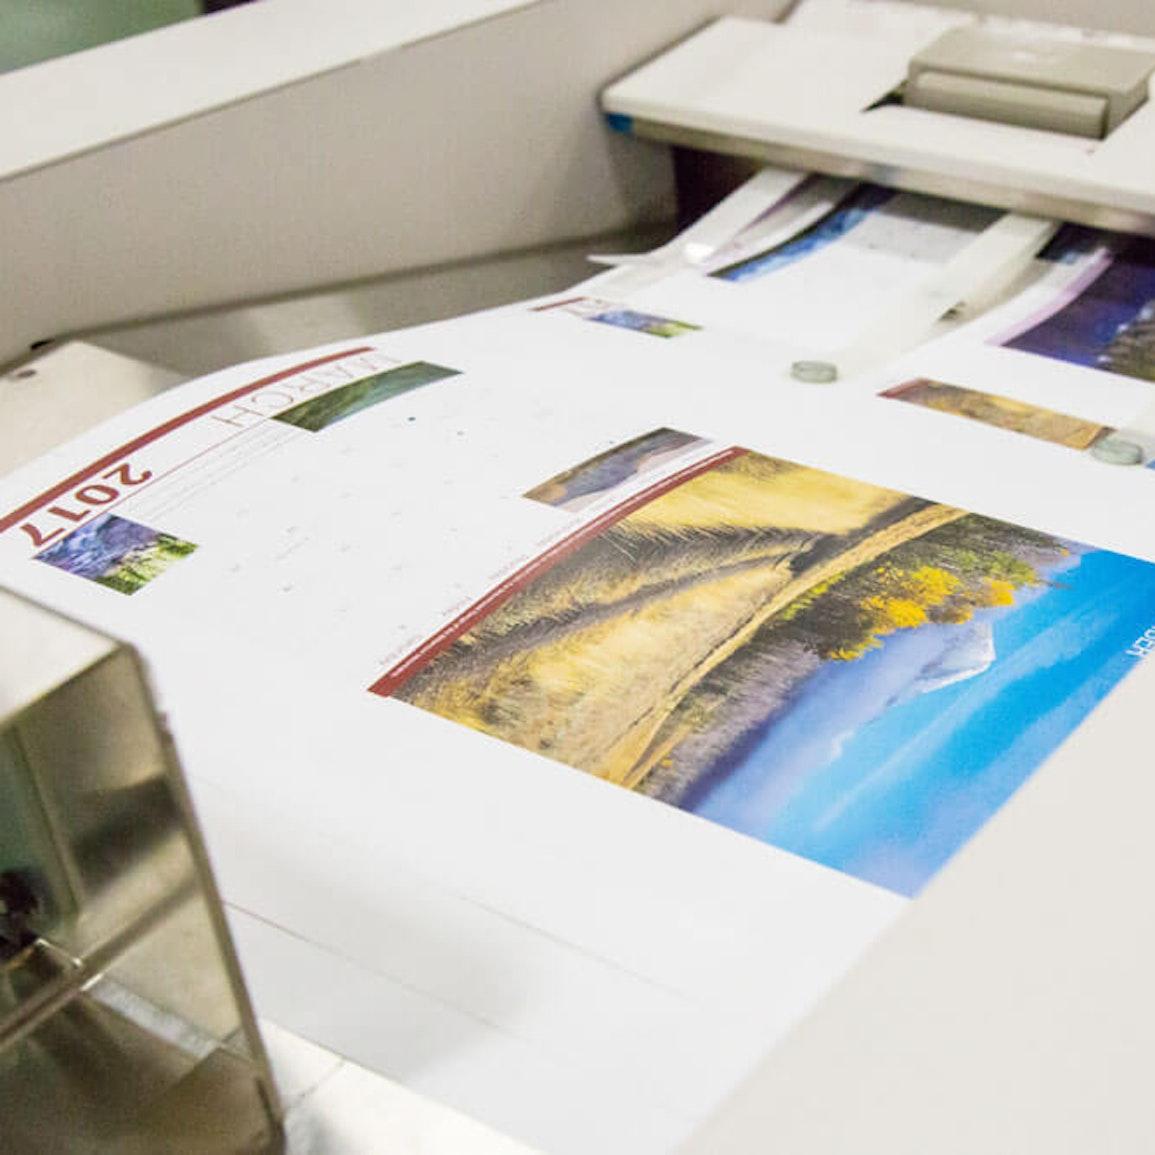 category-calendars-project-spotlight-drawer-printing-2018070501.jpg